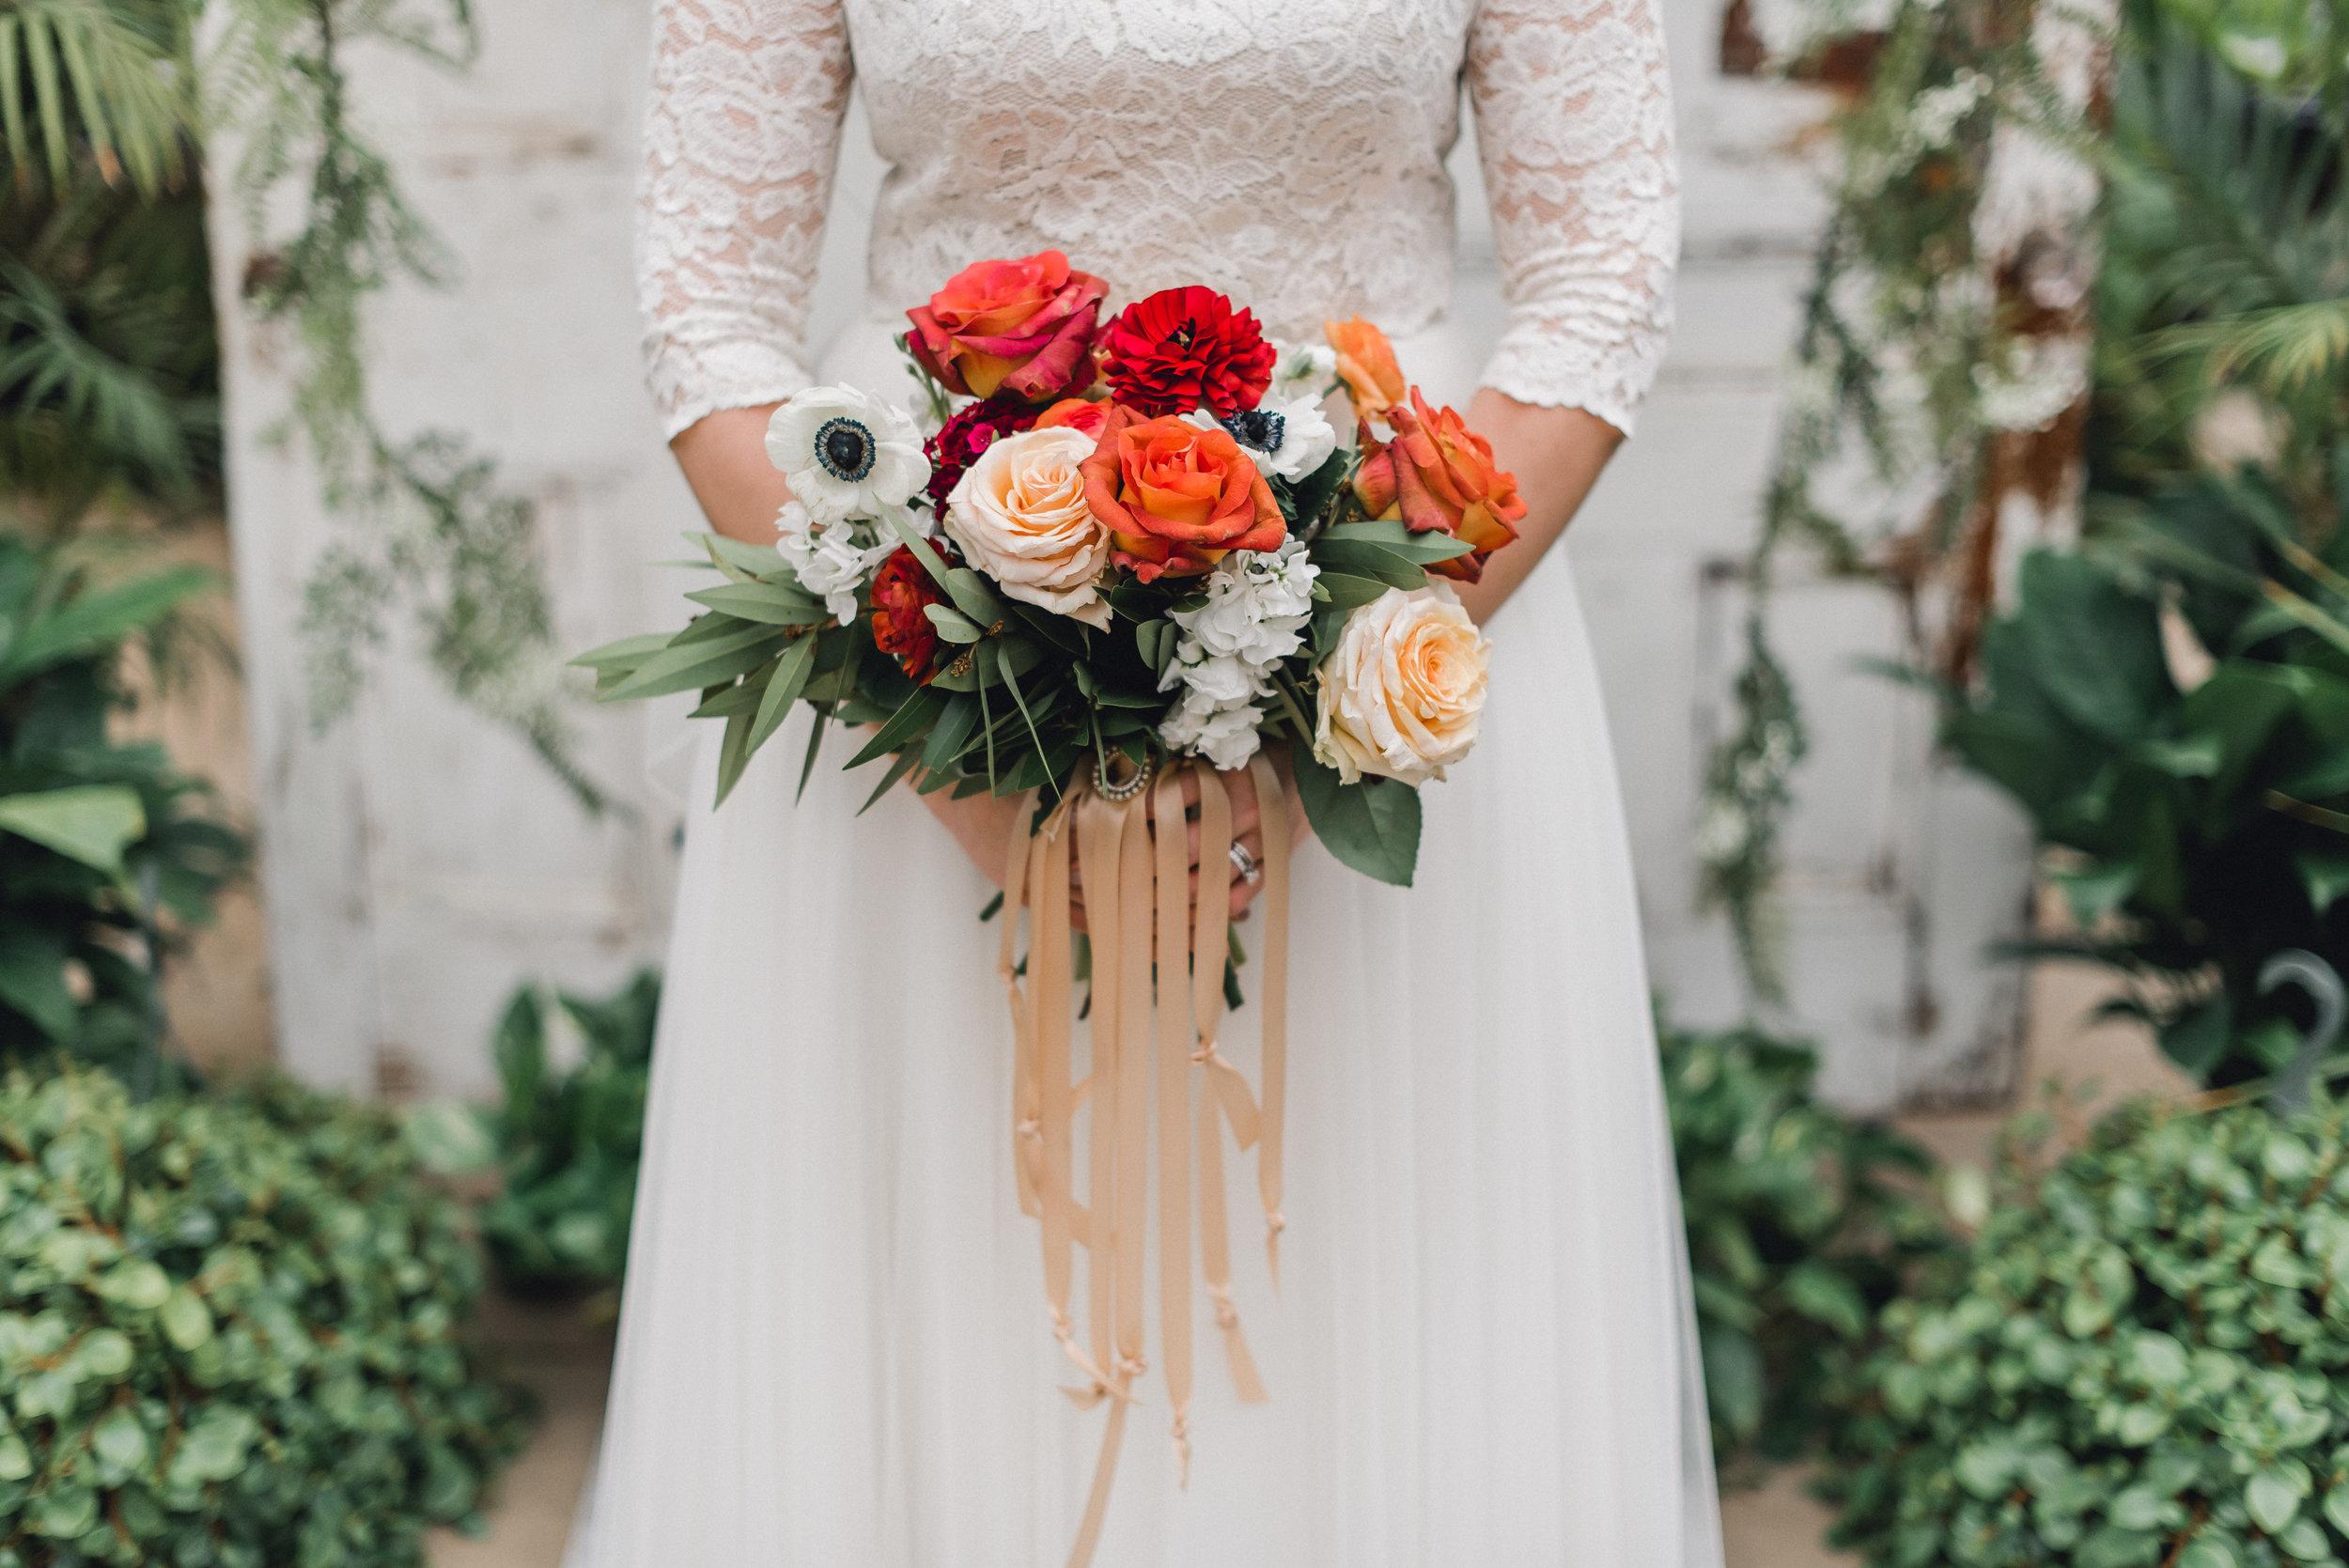 quality-gardens-valencia-wedding-bouquet.jpg